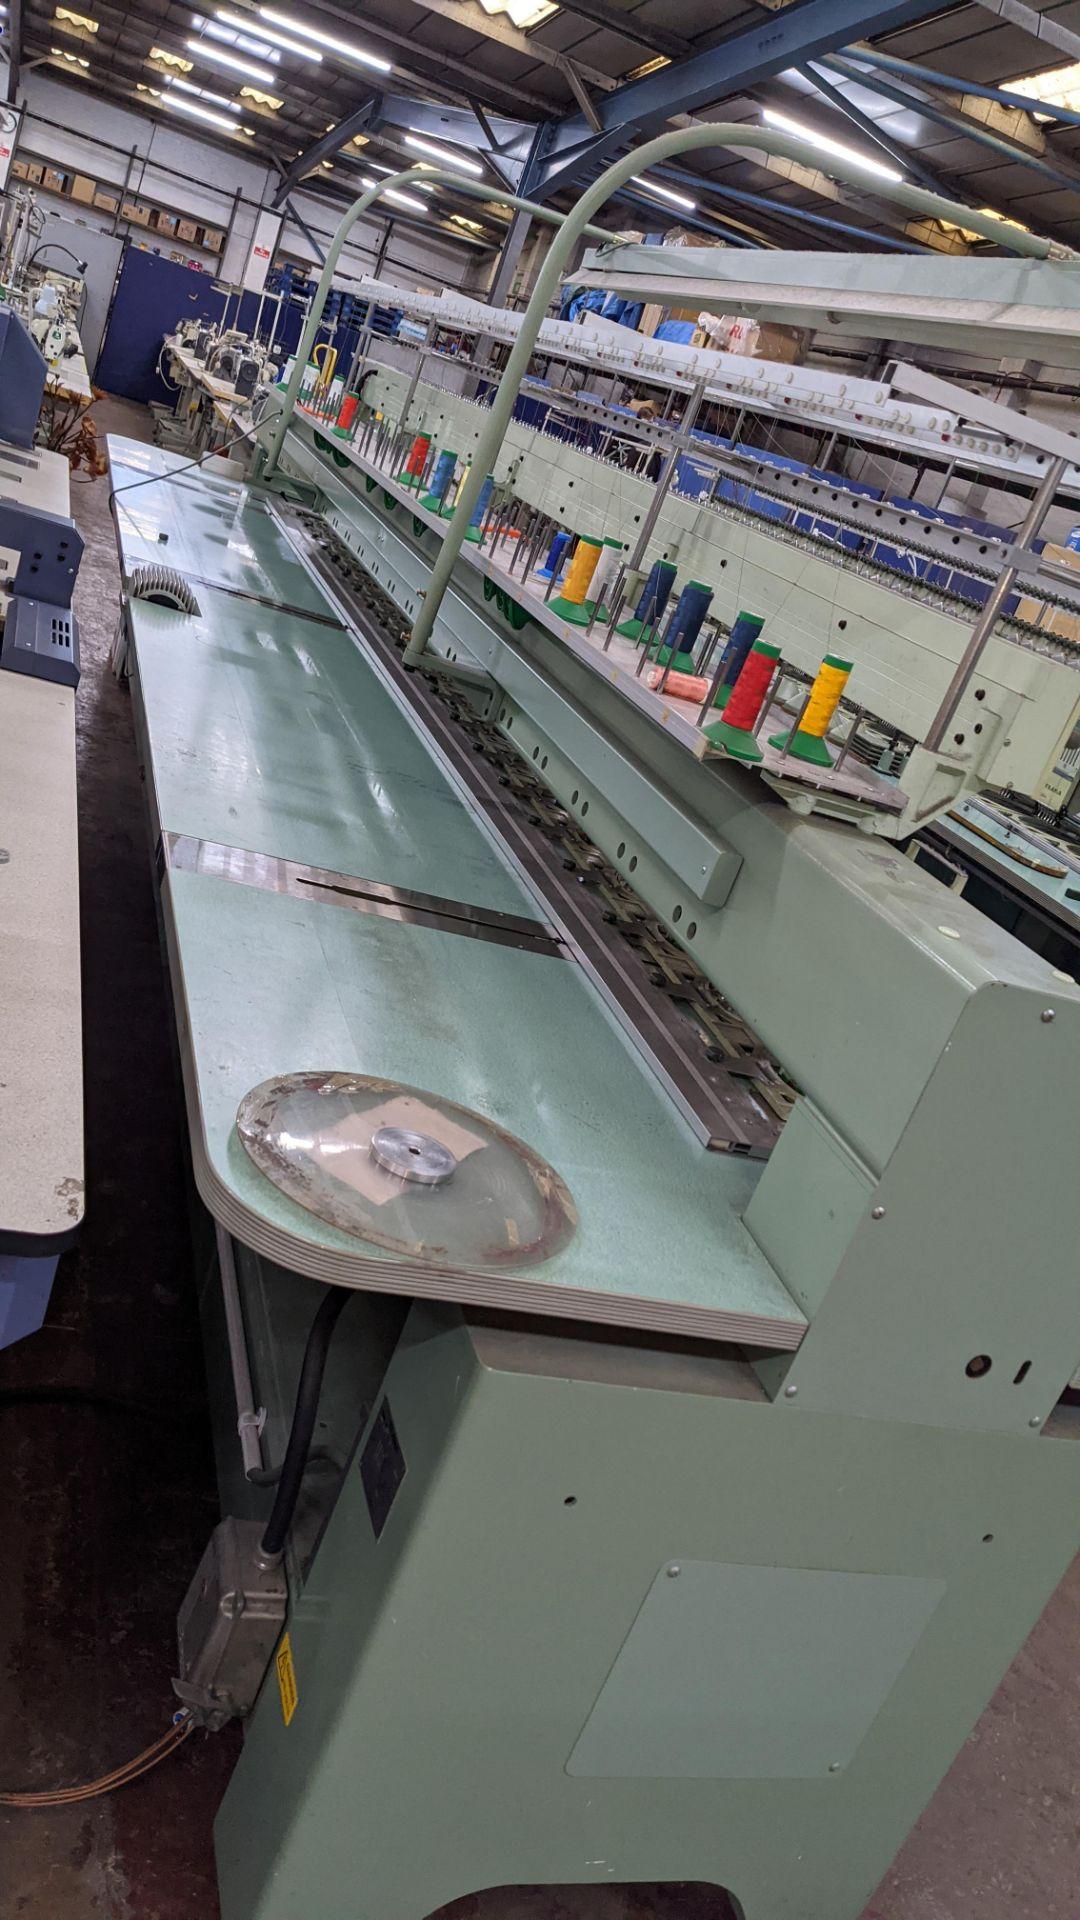 Tokai Tajima electronic 20 head automatic embroidery machine model TMEF-H620 - Image 16 of 25